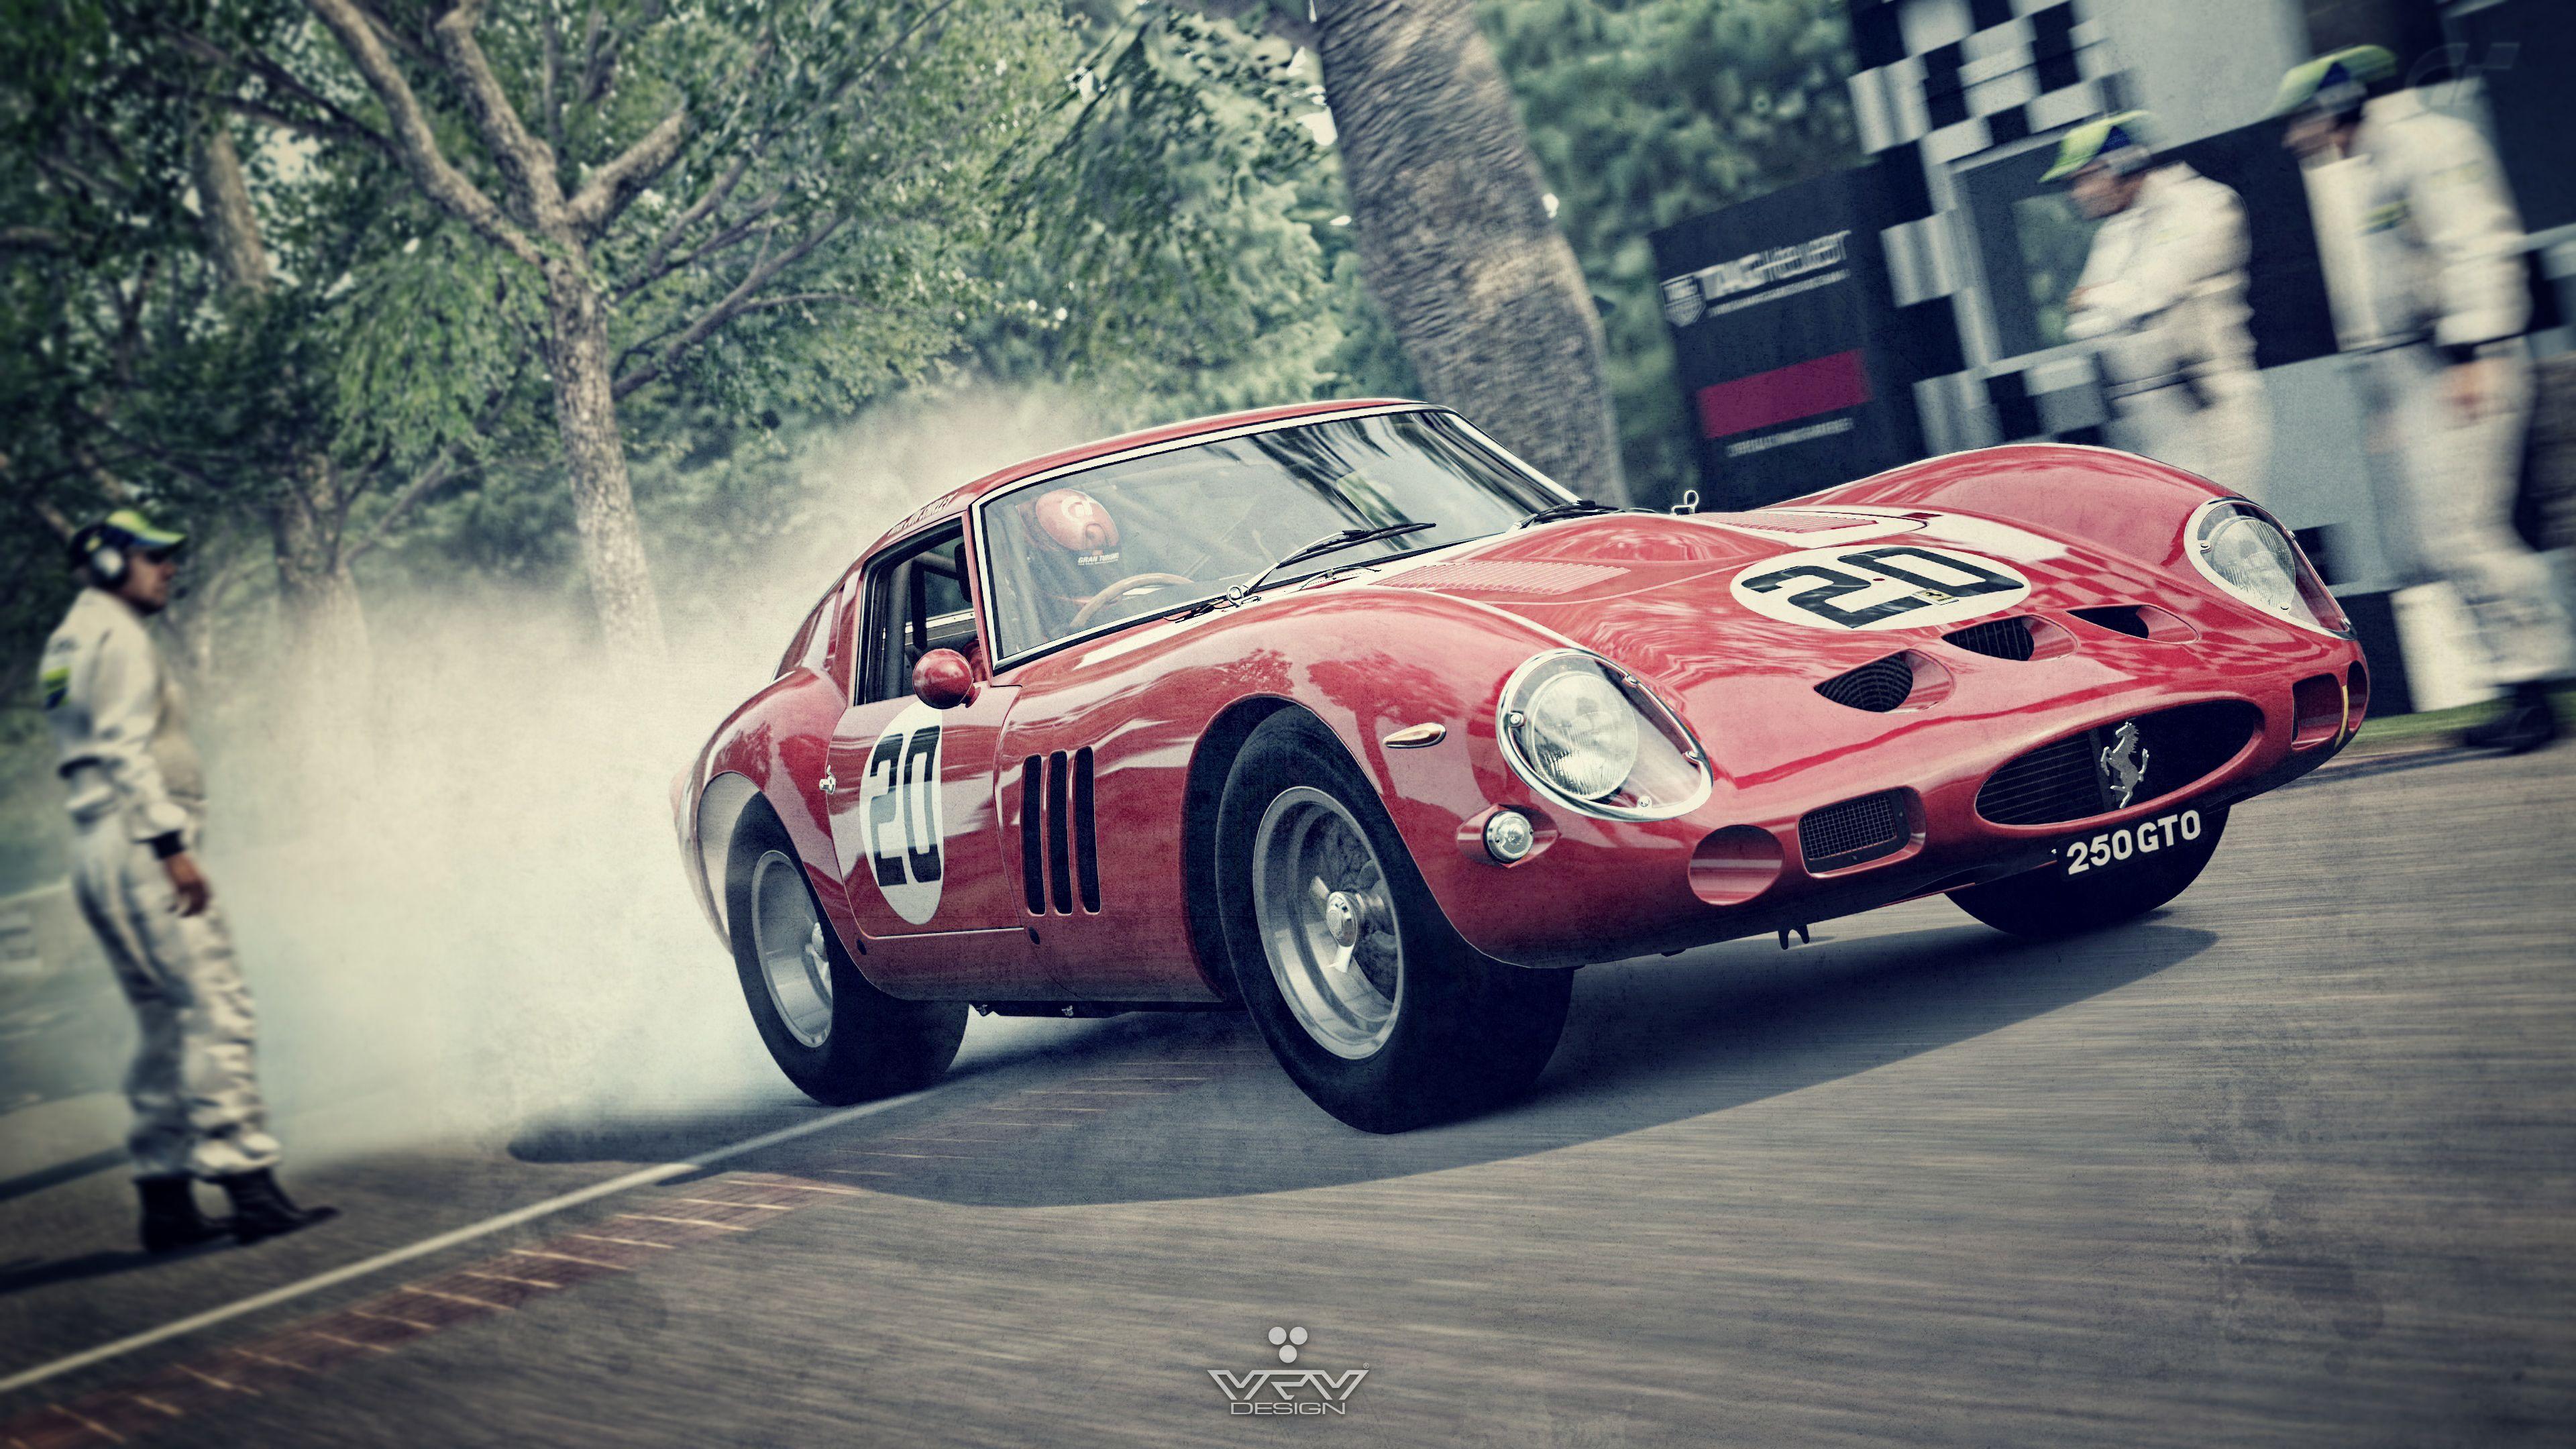 Ferrari 250 Gto Wallpapers Car Wallpapers Wallpaper Send